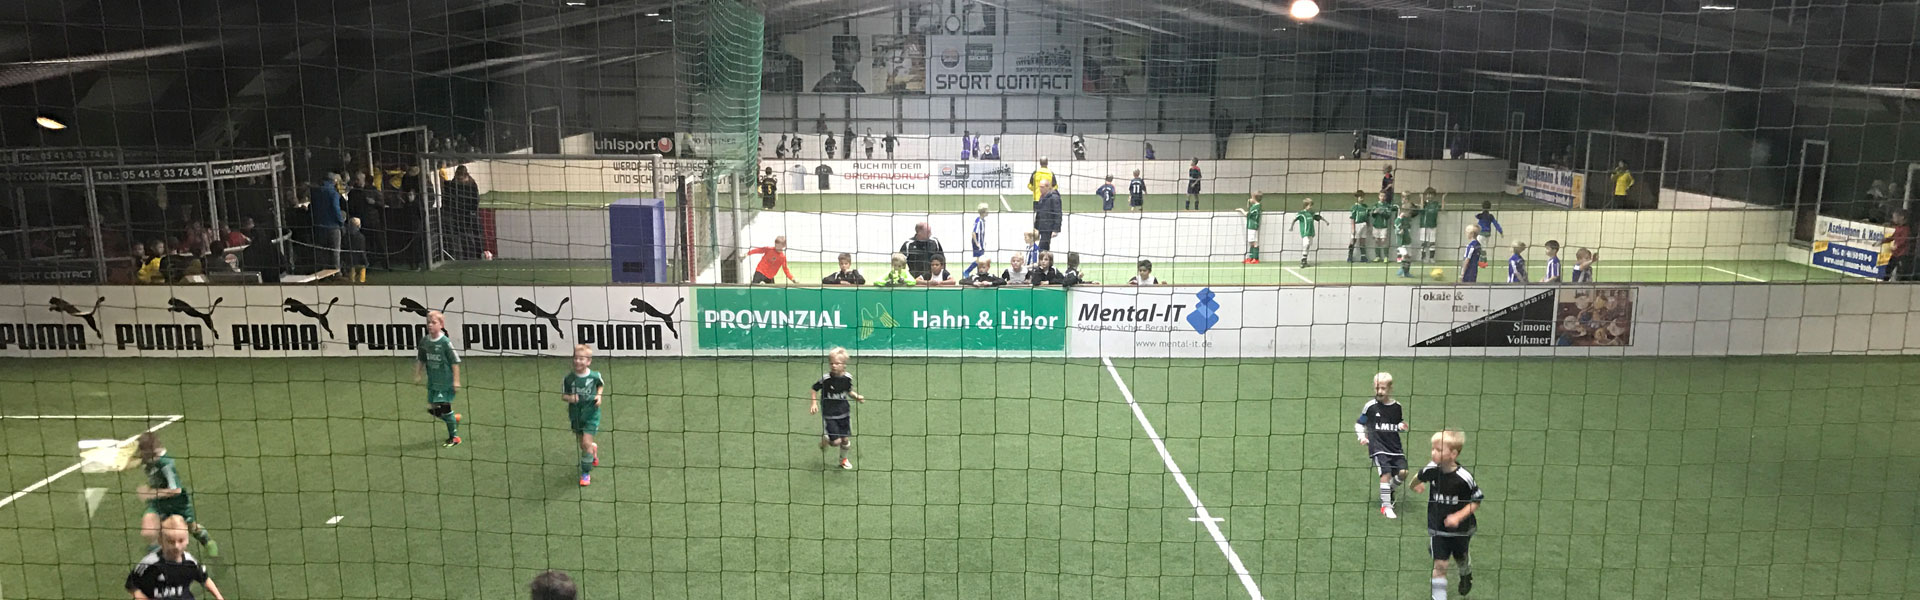 Soccer Center Osnabrück | Courts